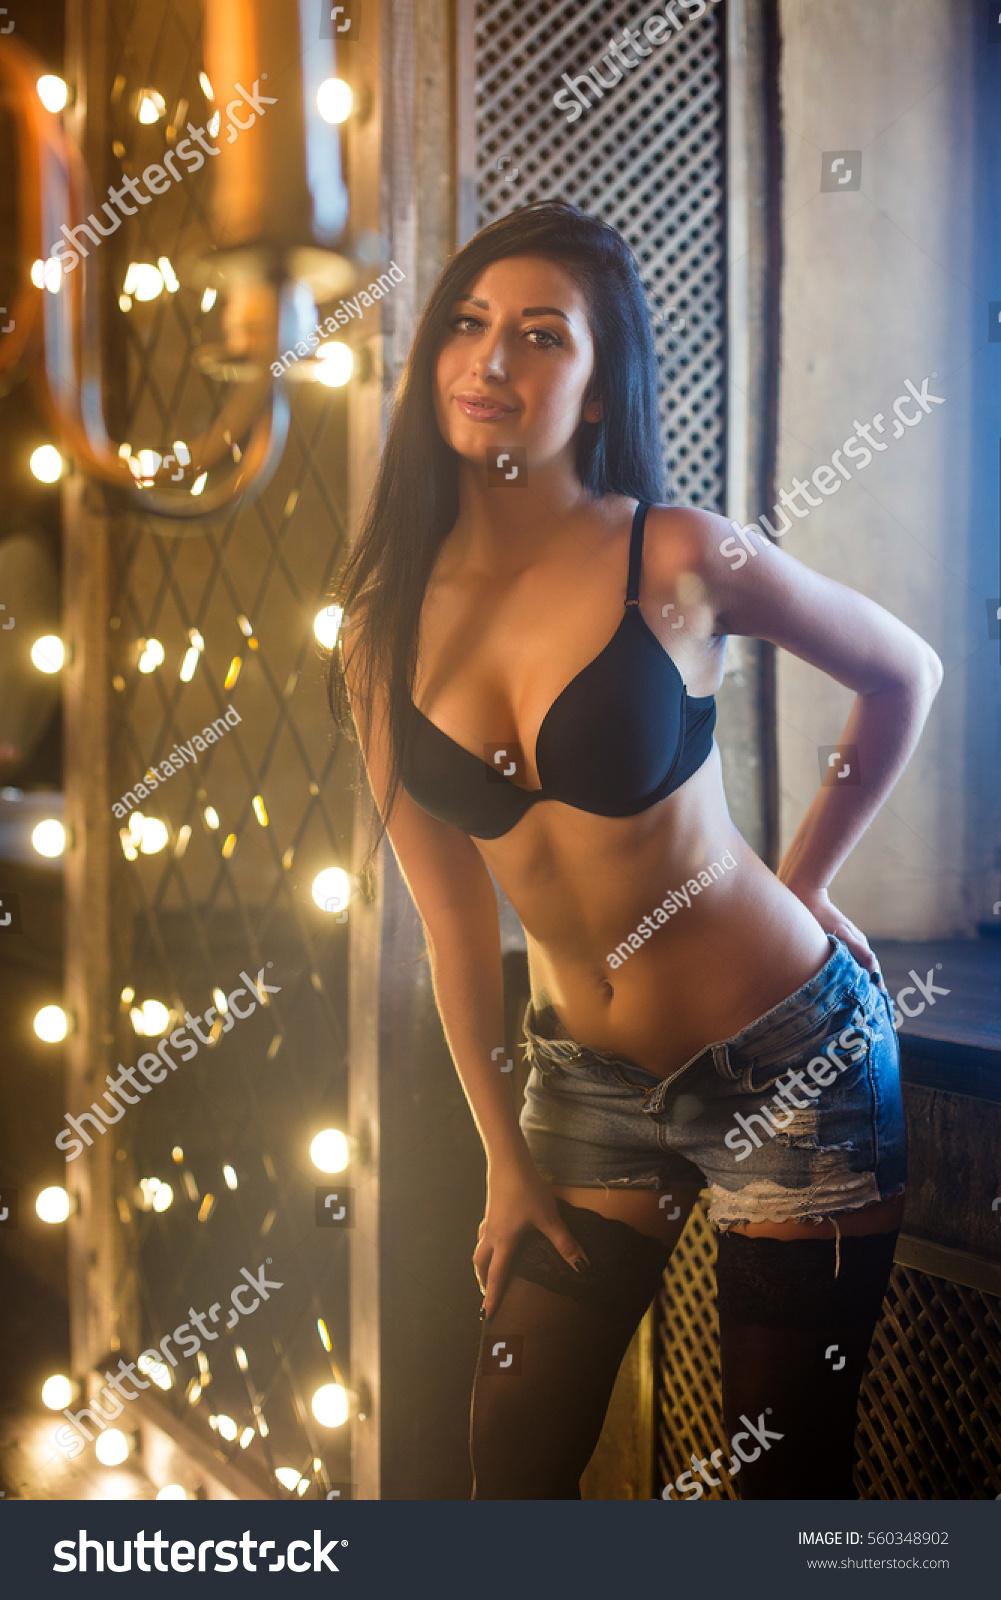 Beautiful Young Girl Lingerie Stock Photo 560348902